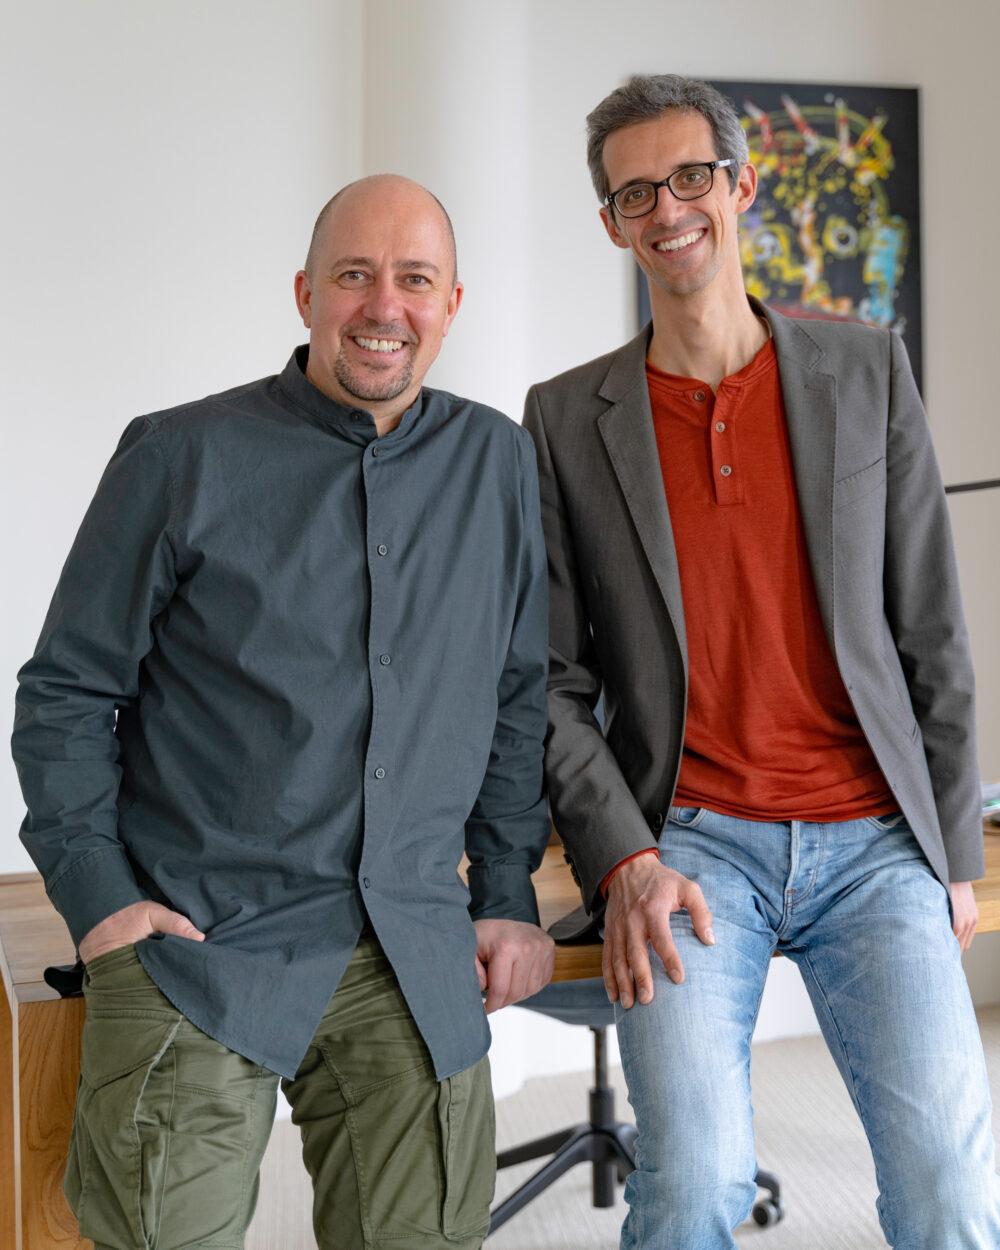 Dietmar CEO, Johannes CFO